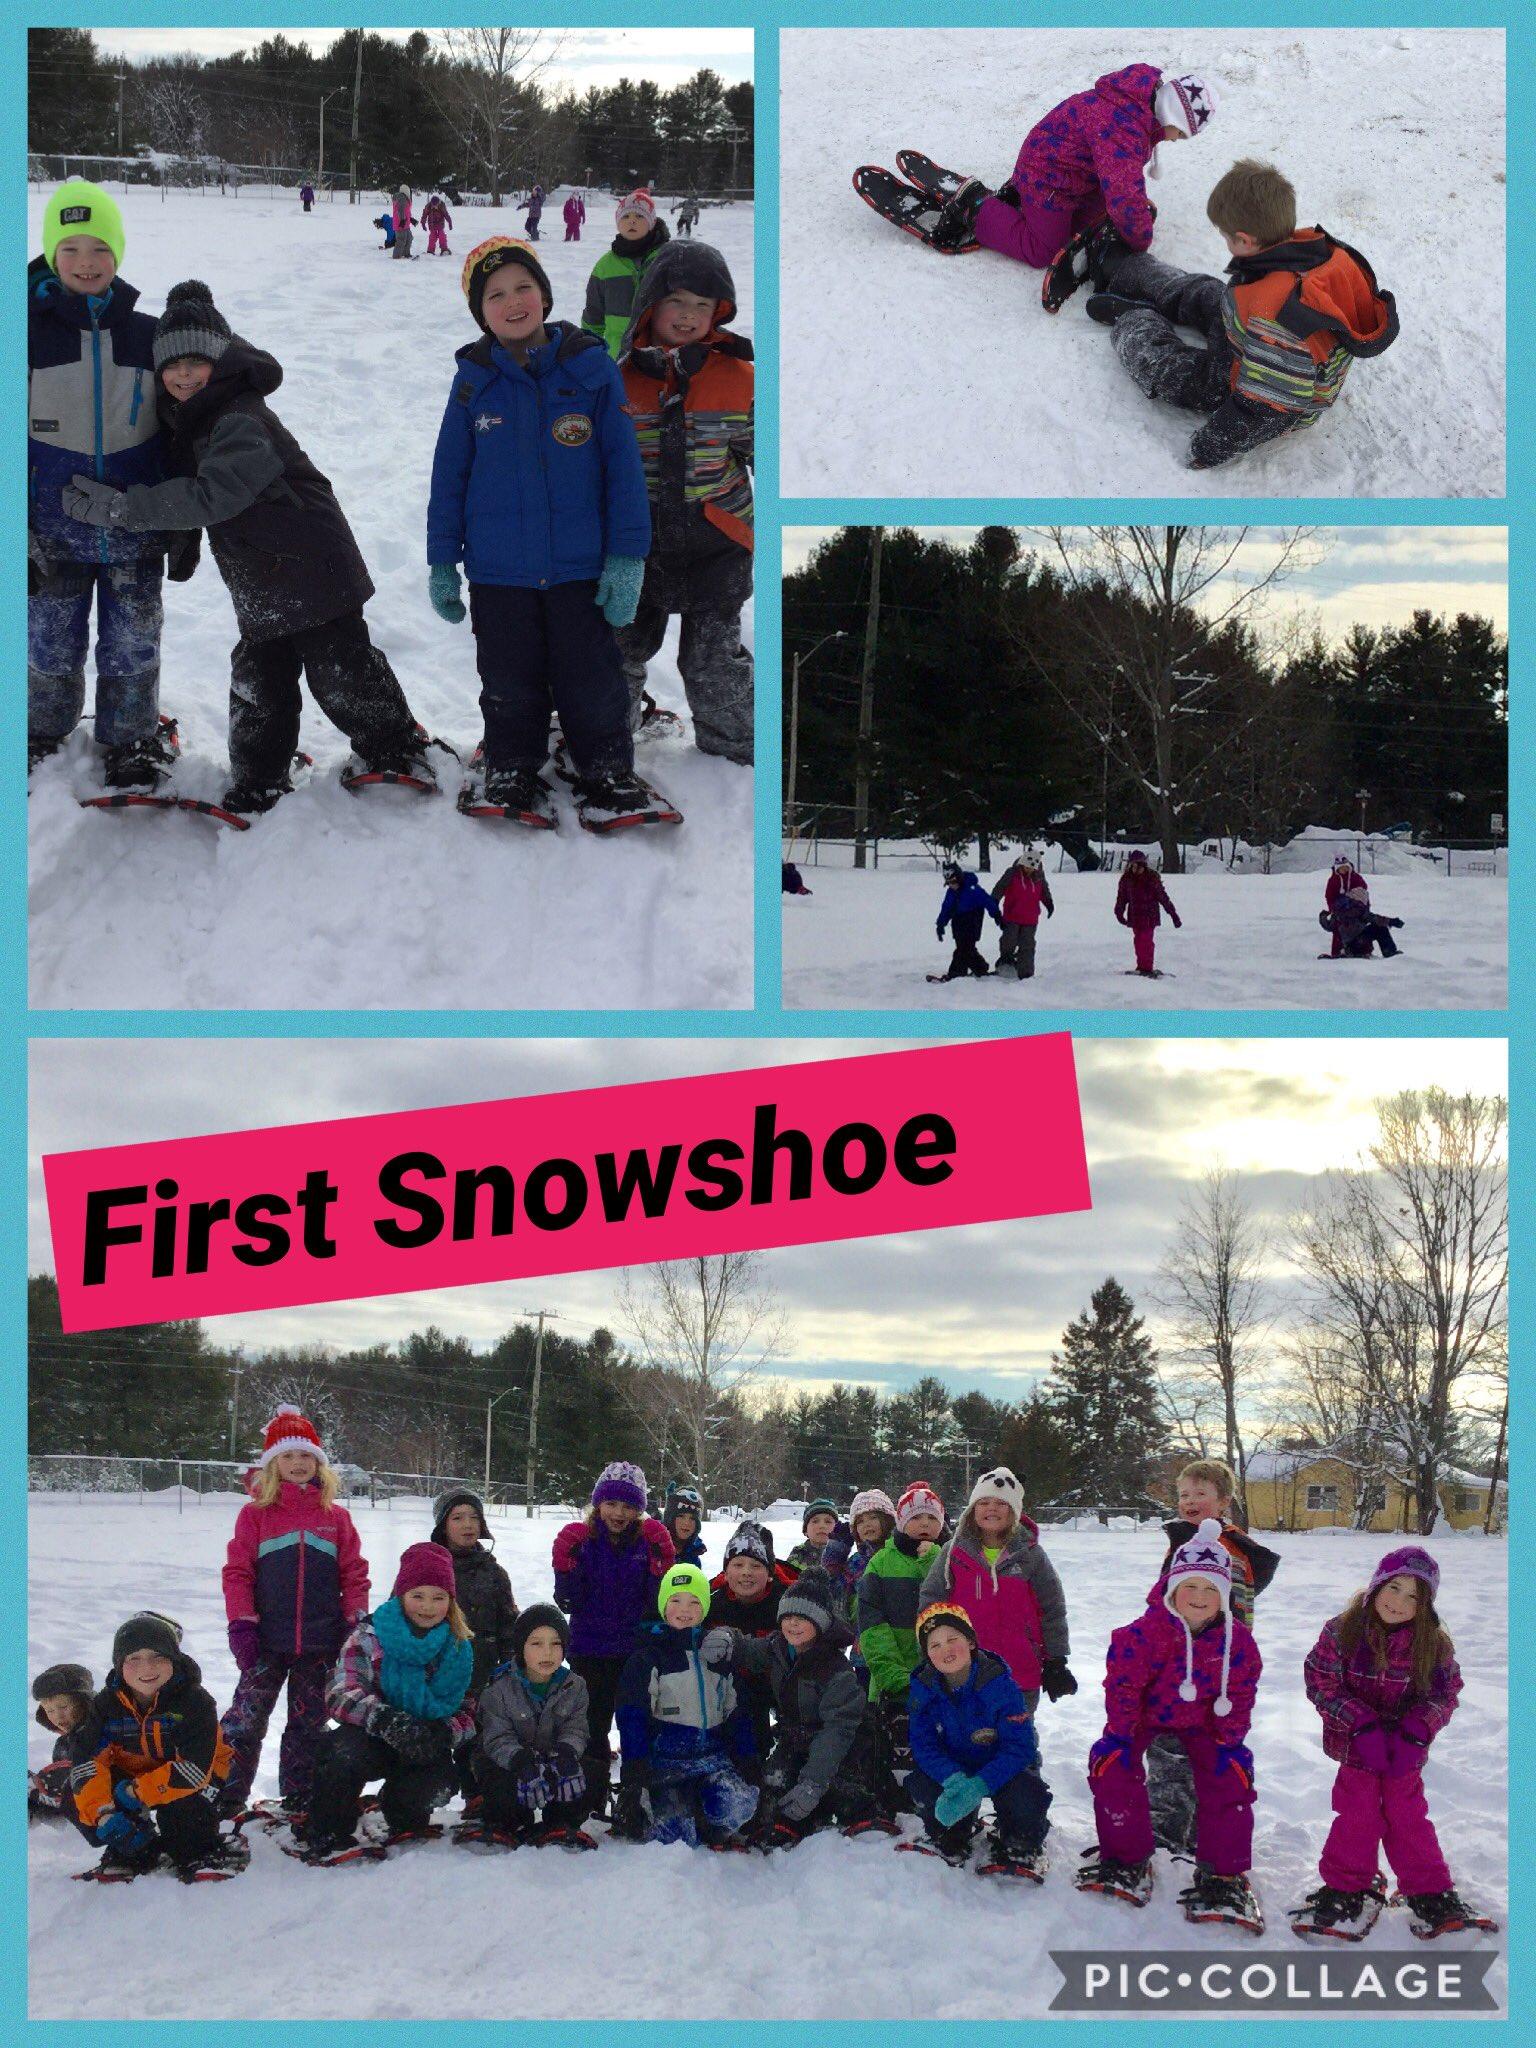 First #Snowshoe of the season! #healthytldsb @tldsb @MacaulayPS @SMHealthySchool #tldsblearns @_PuzzlePeace #feedallfour https://t.co/ZM5RmBgBiN